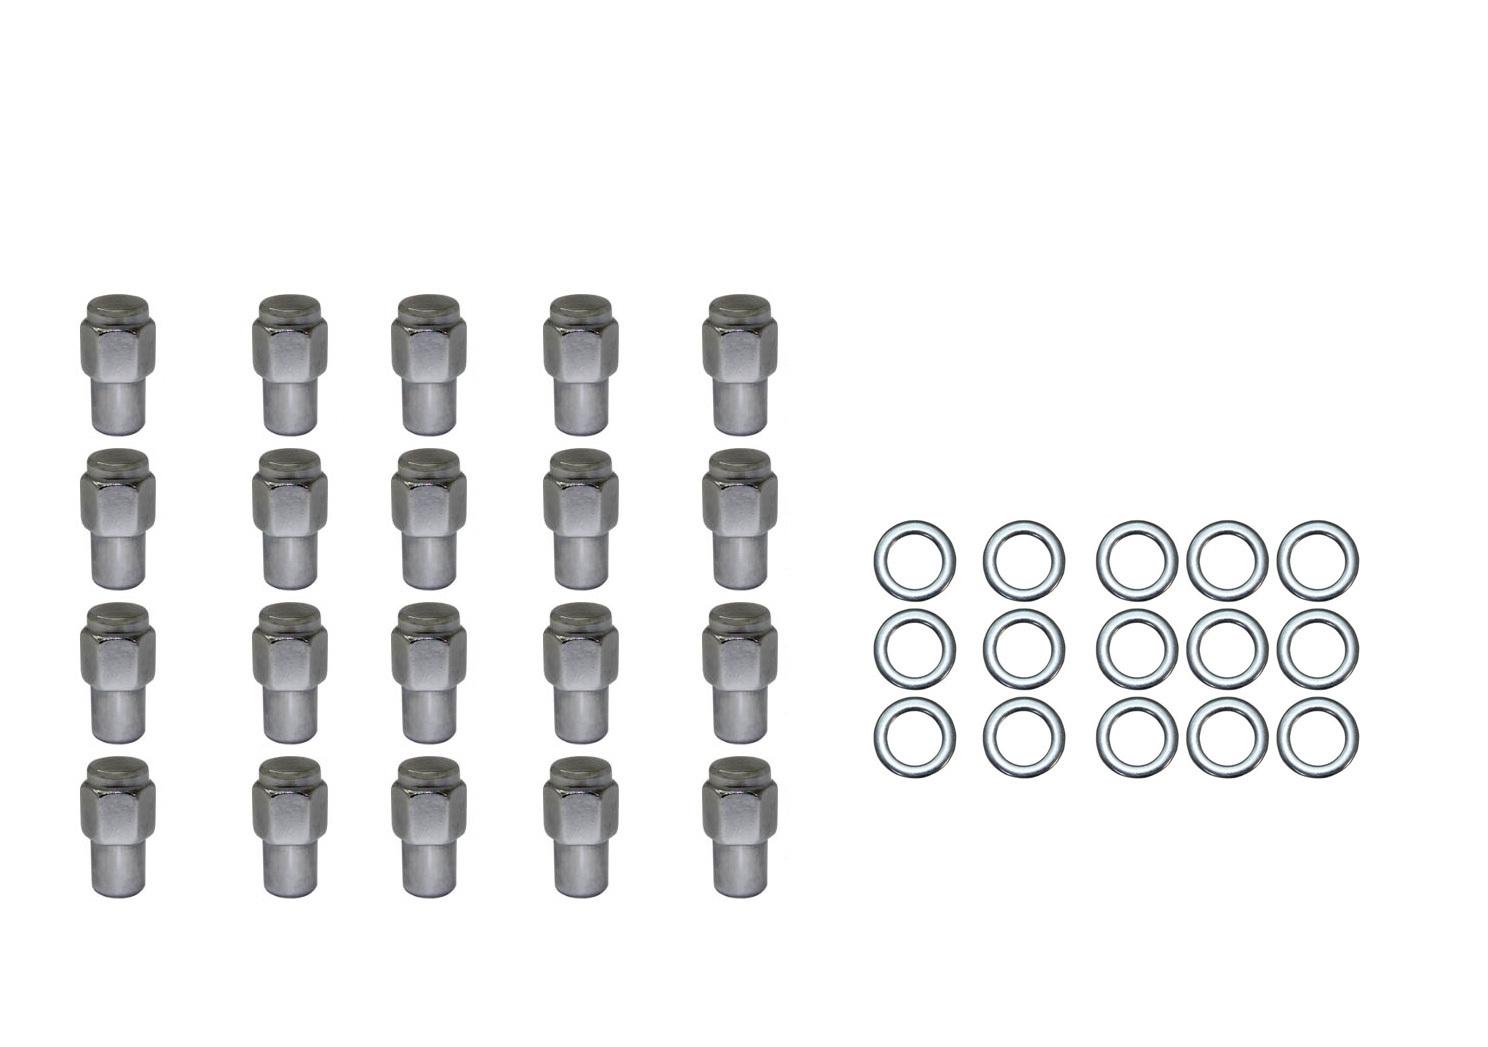 20 Pc Set Chrome Steel Mag Shank Lug Nuts 12mm X 1 25 For